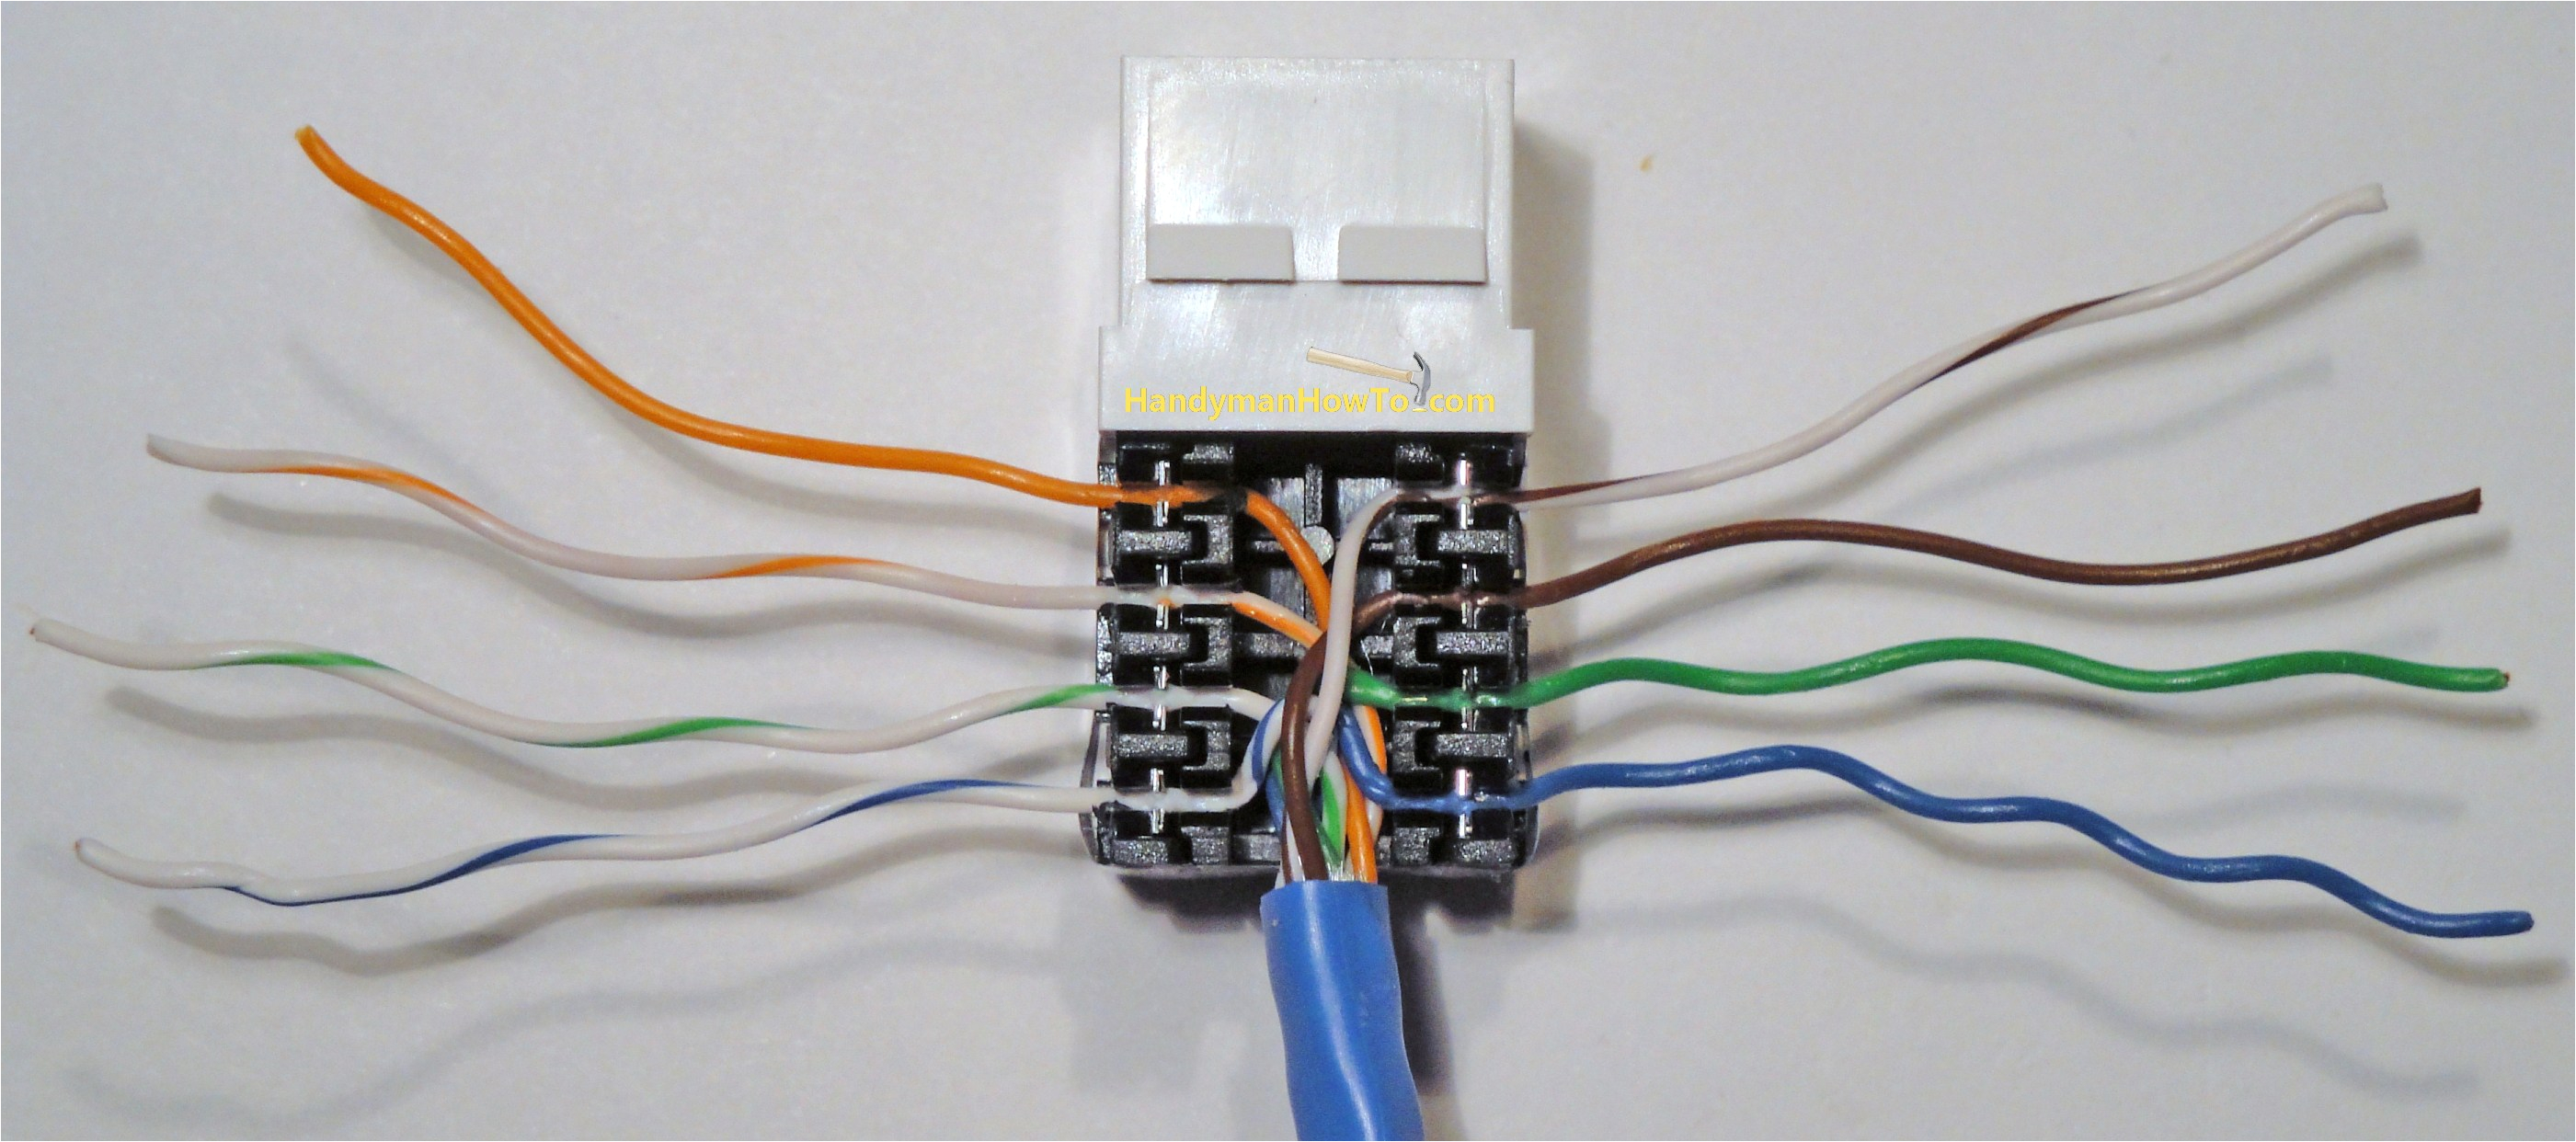 cat 5 jack wiring circuit diagram wiring diagram cat 5 wall jack wiring diagram cat5 phone jack wiring